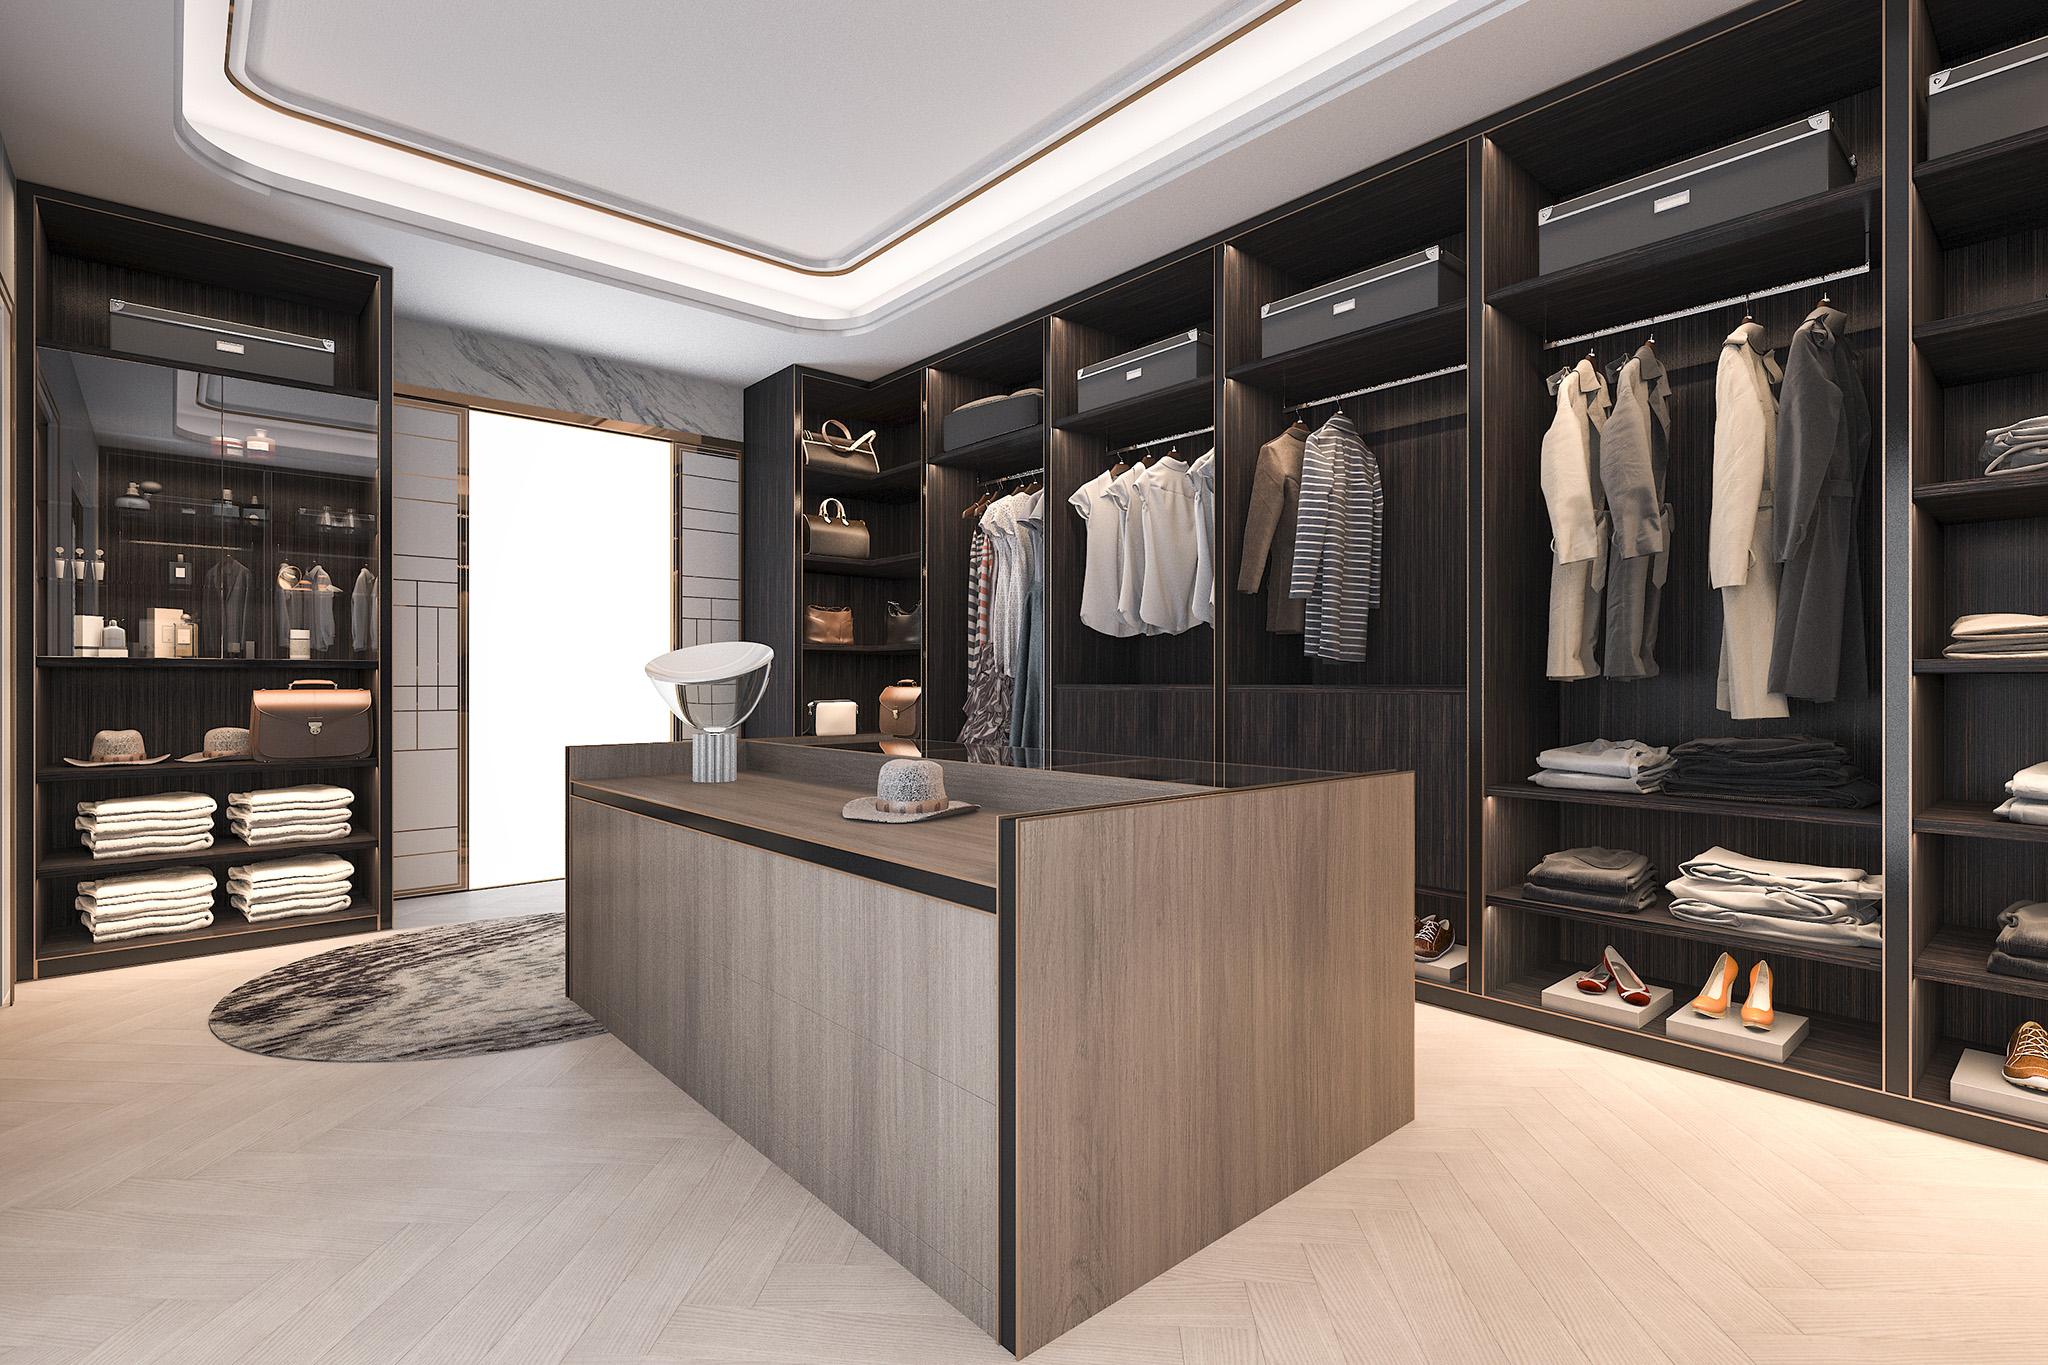 dressing room, dressing room island, grey wardrobes, bedroom furniture ideas